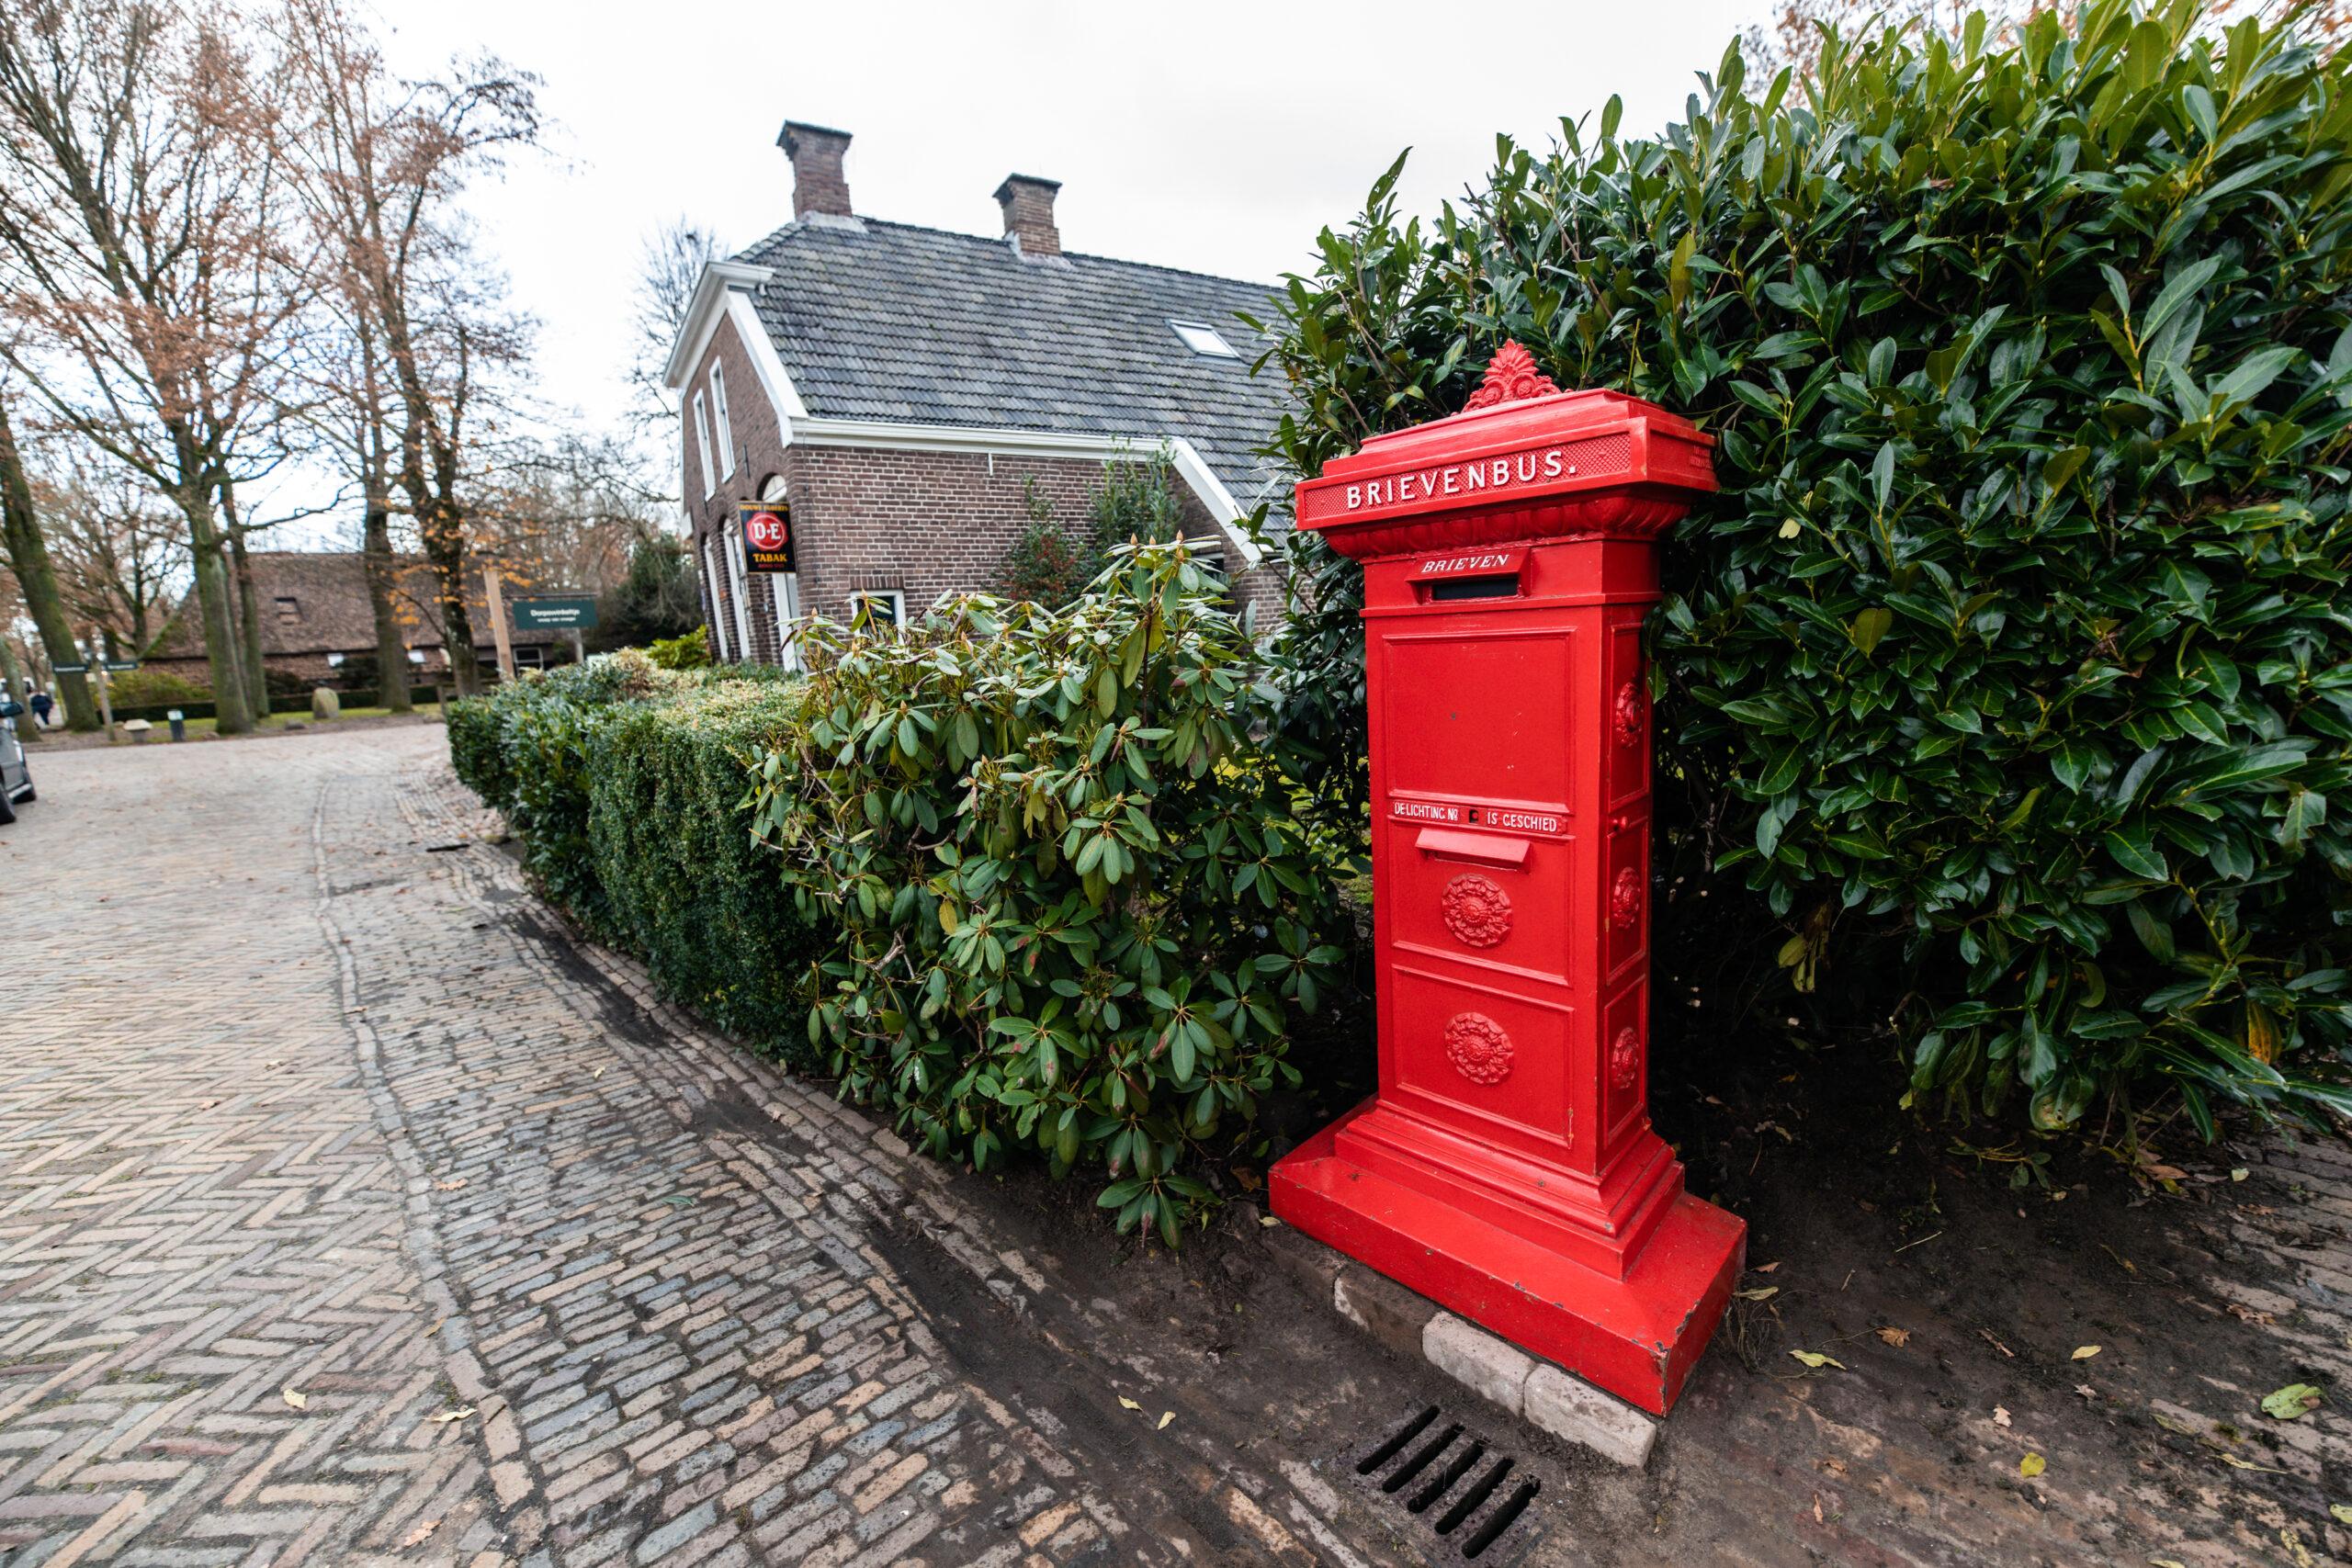 PostNL plaatst historische brievenbus terug in monumentendorp Orvelte